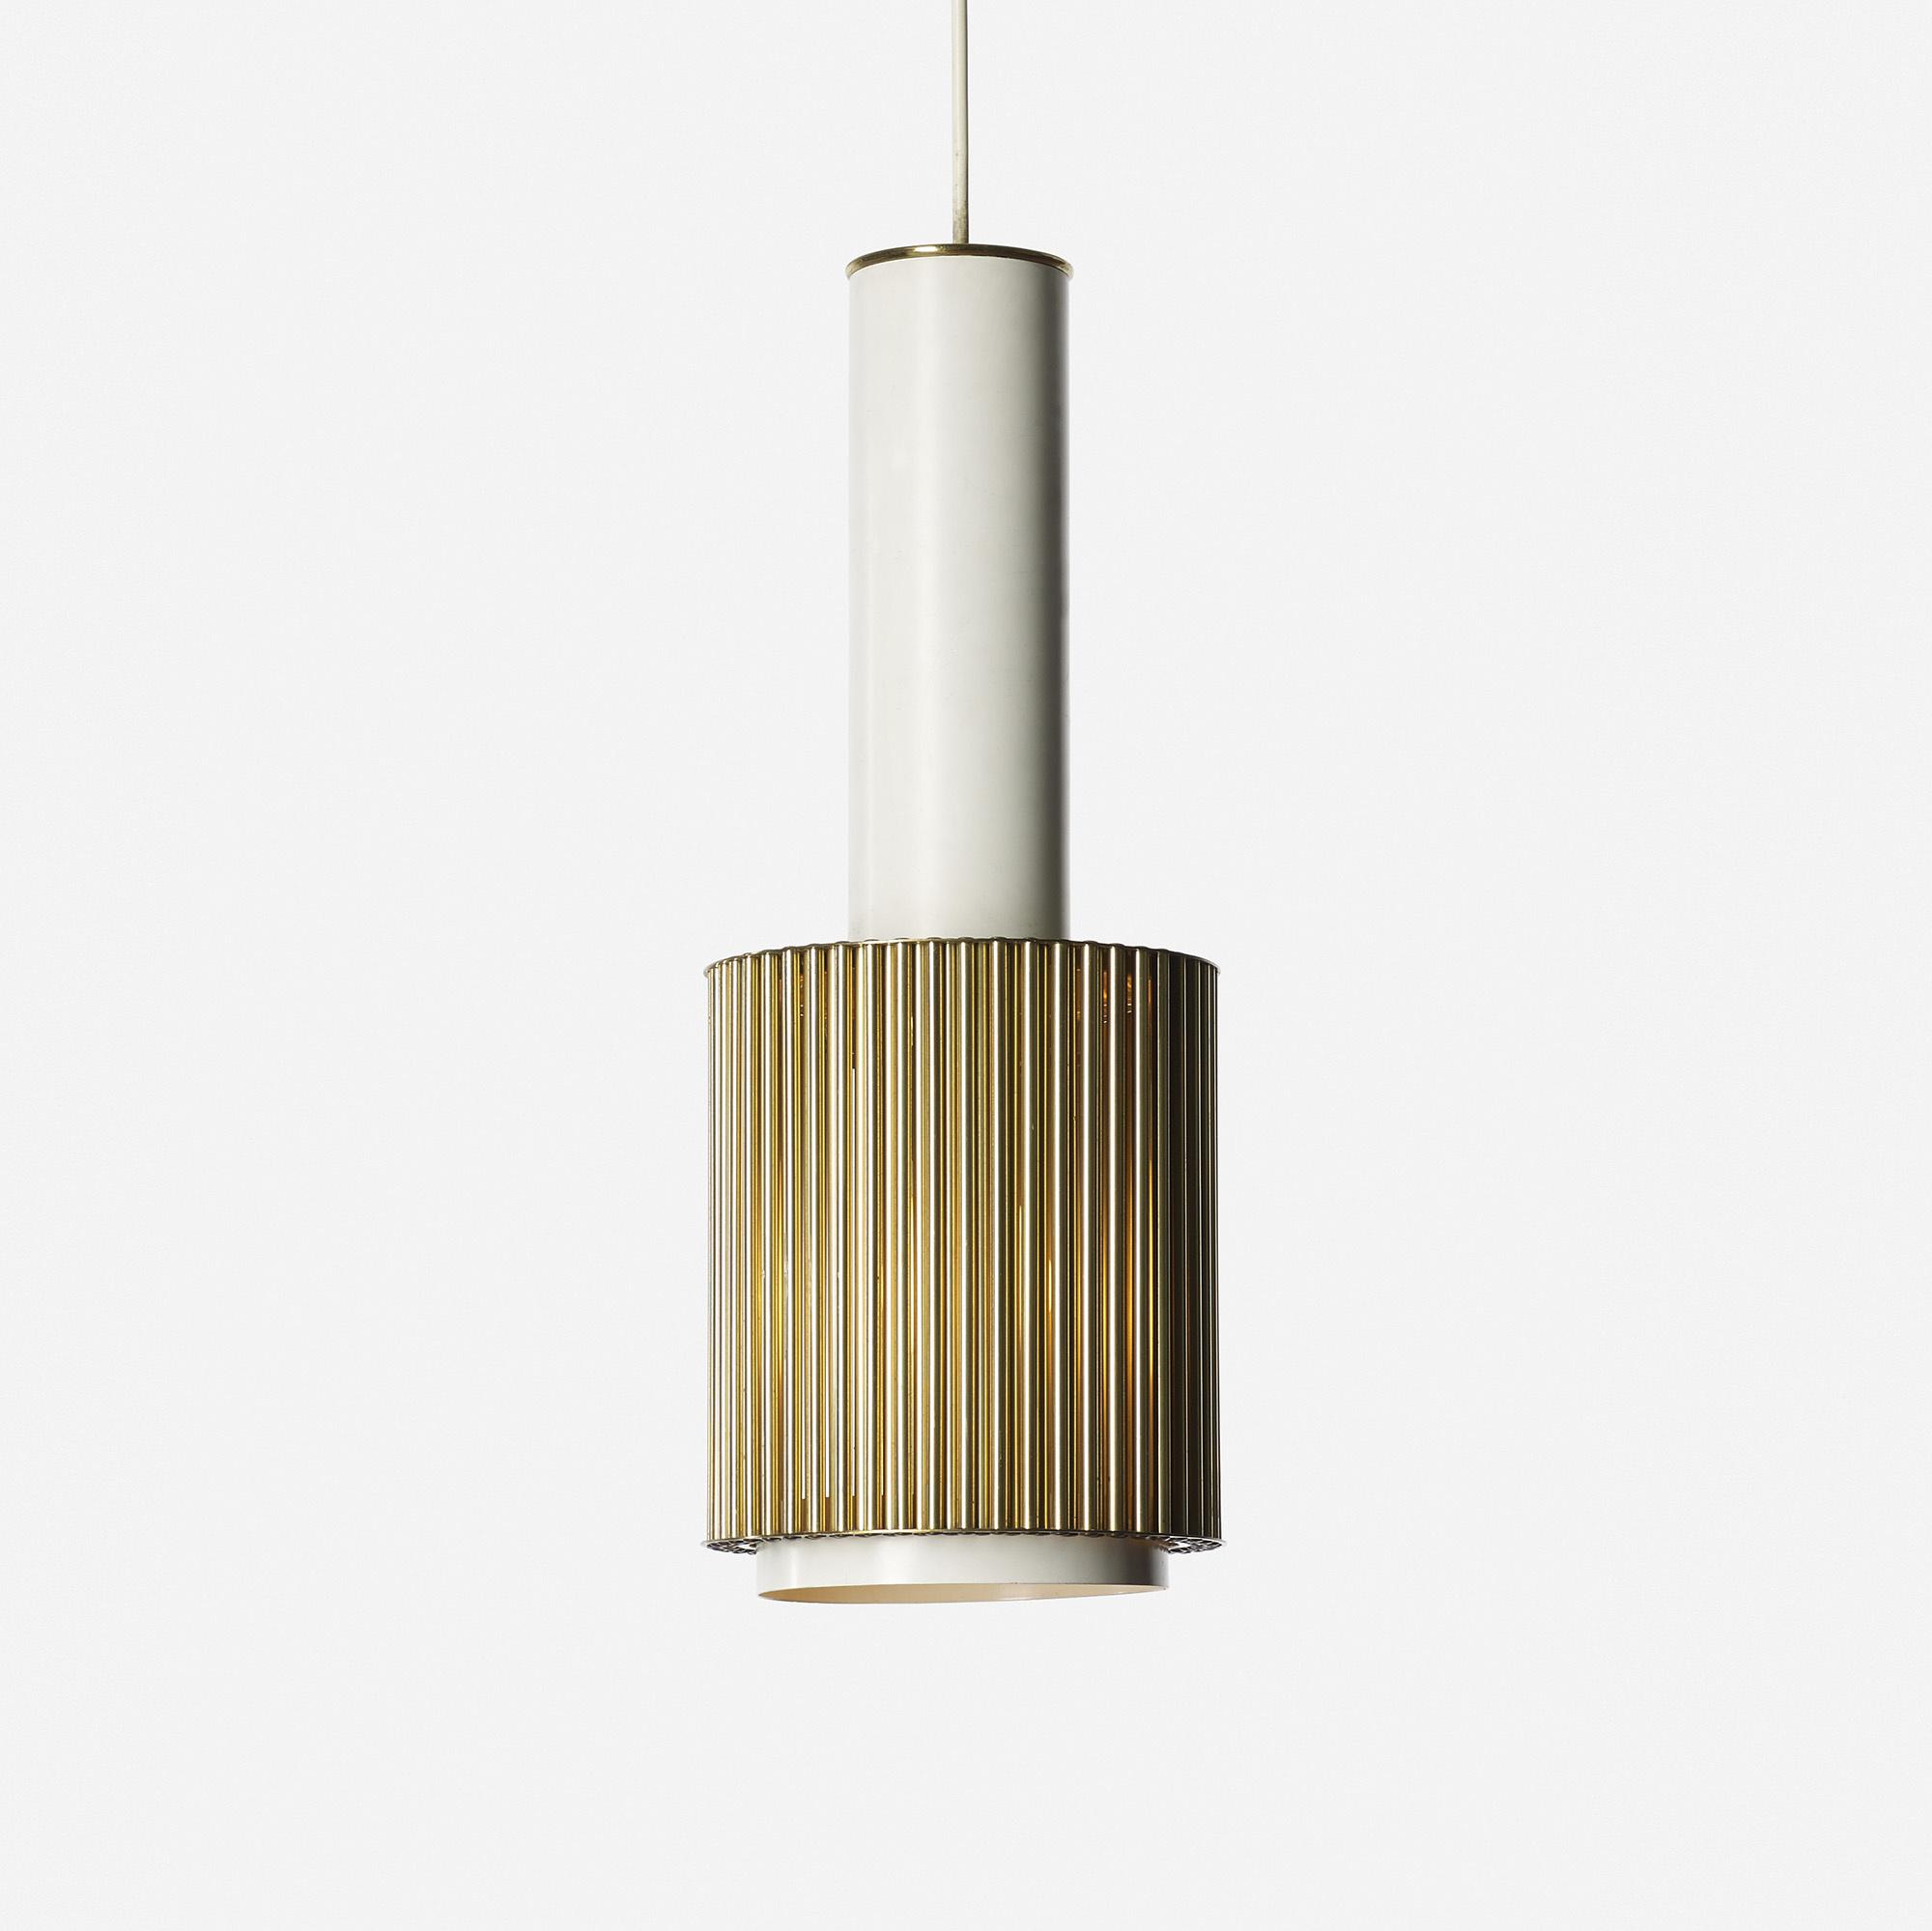 290 alvar aalto pendant lamp model a111 scandinavian design 290 alvar aalto pendant lamp model a111 1 of 2 arubaitofo Images